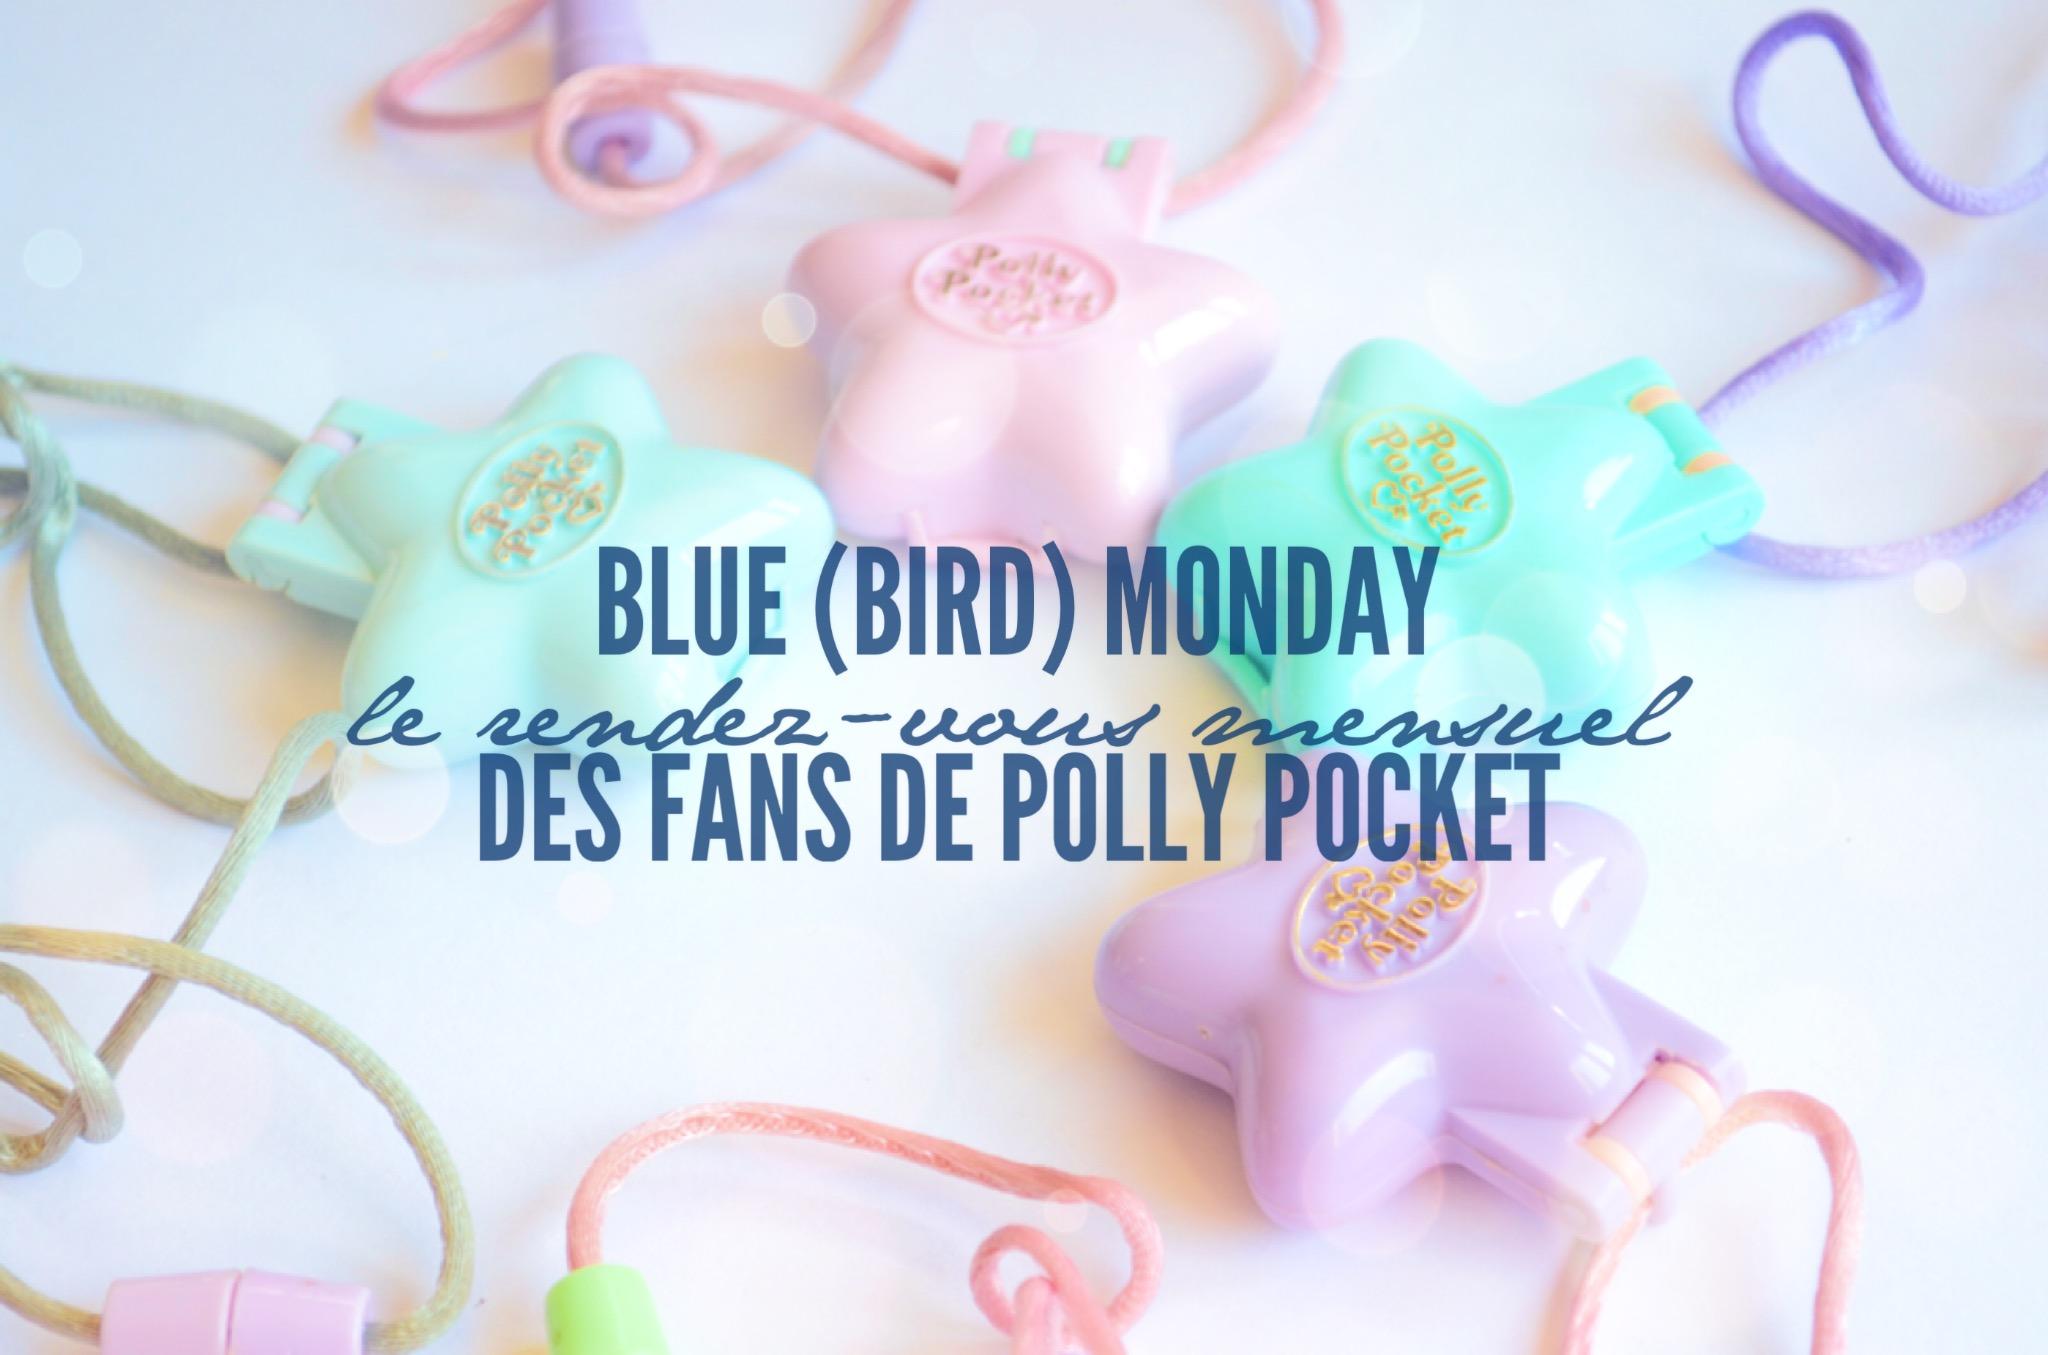 Blue bird monday